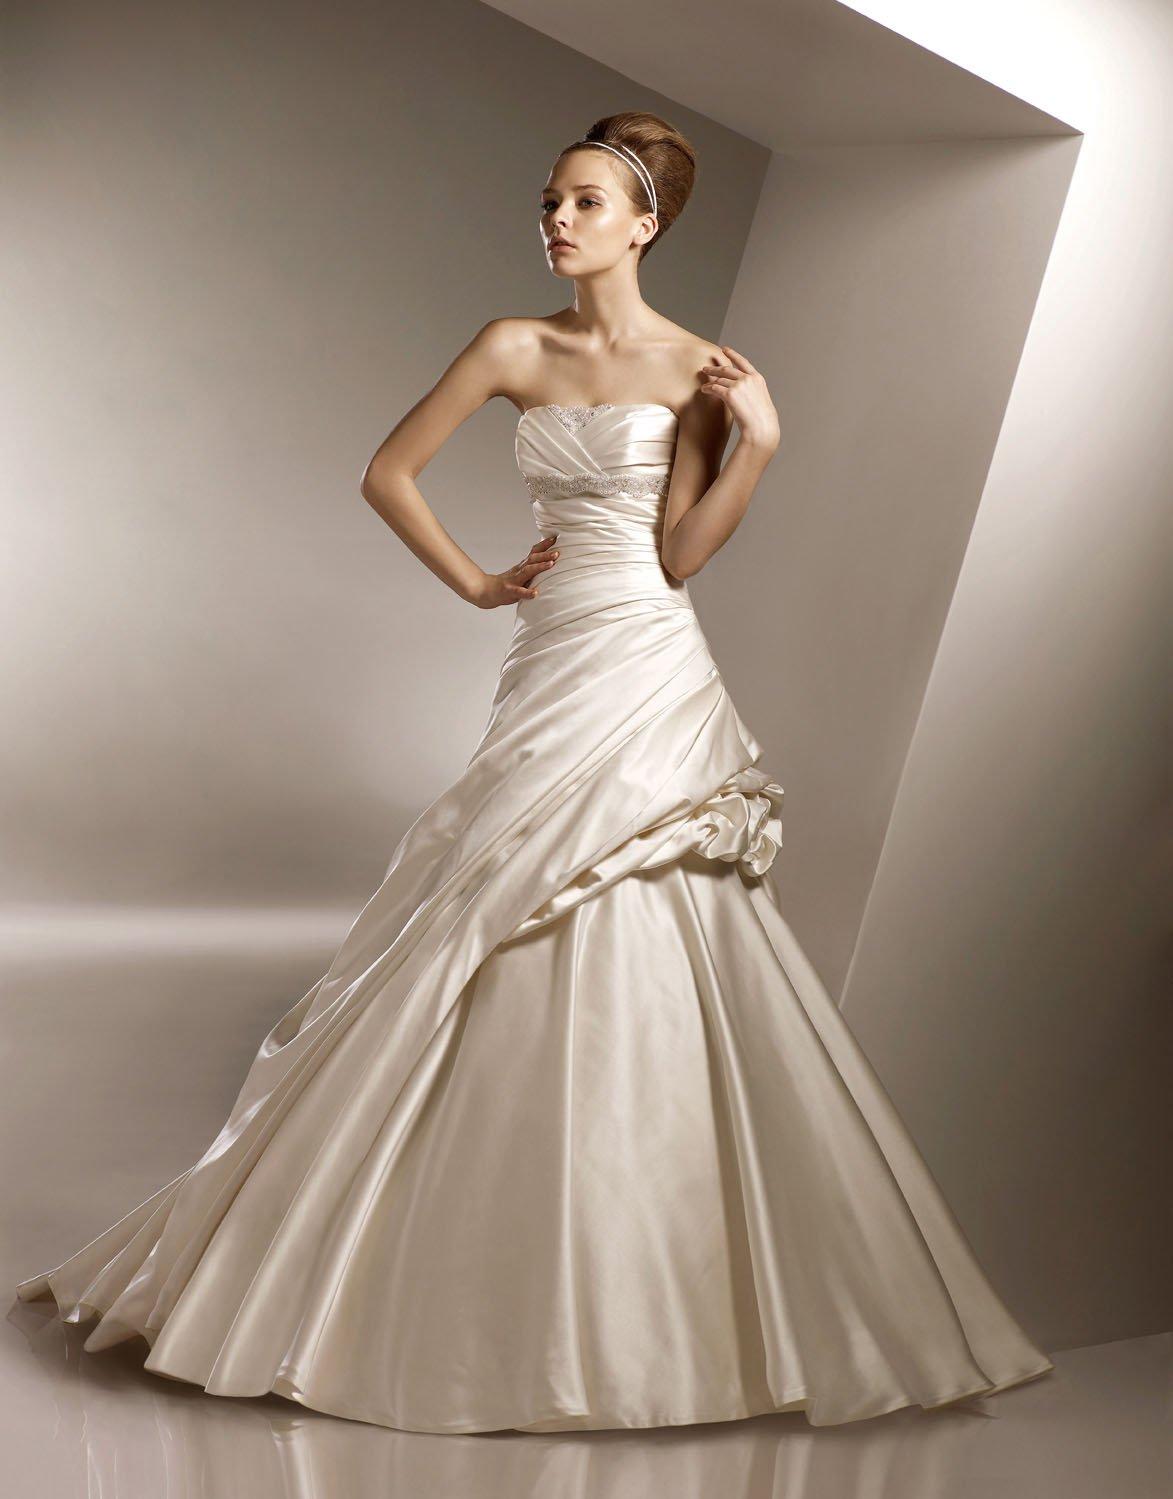 Straight Neckline Strapless Taffeta Wedding Dress Bridal Gown